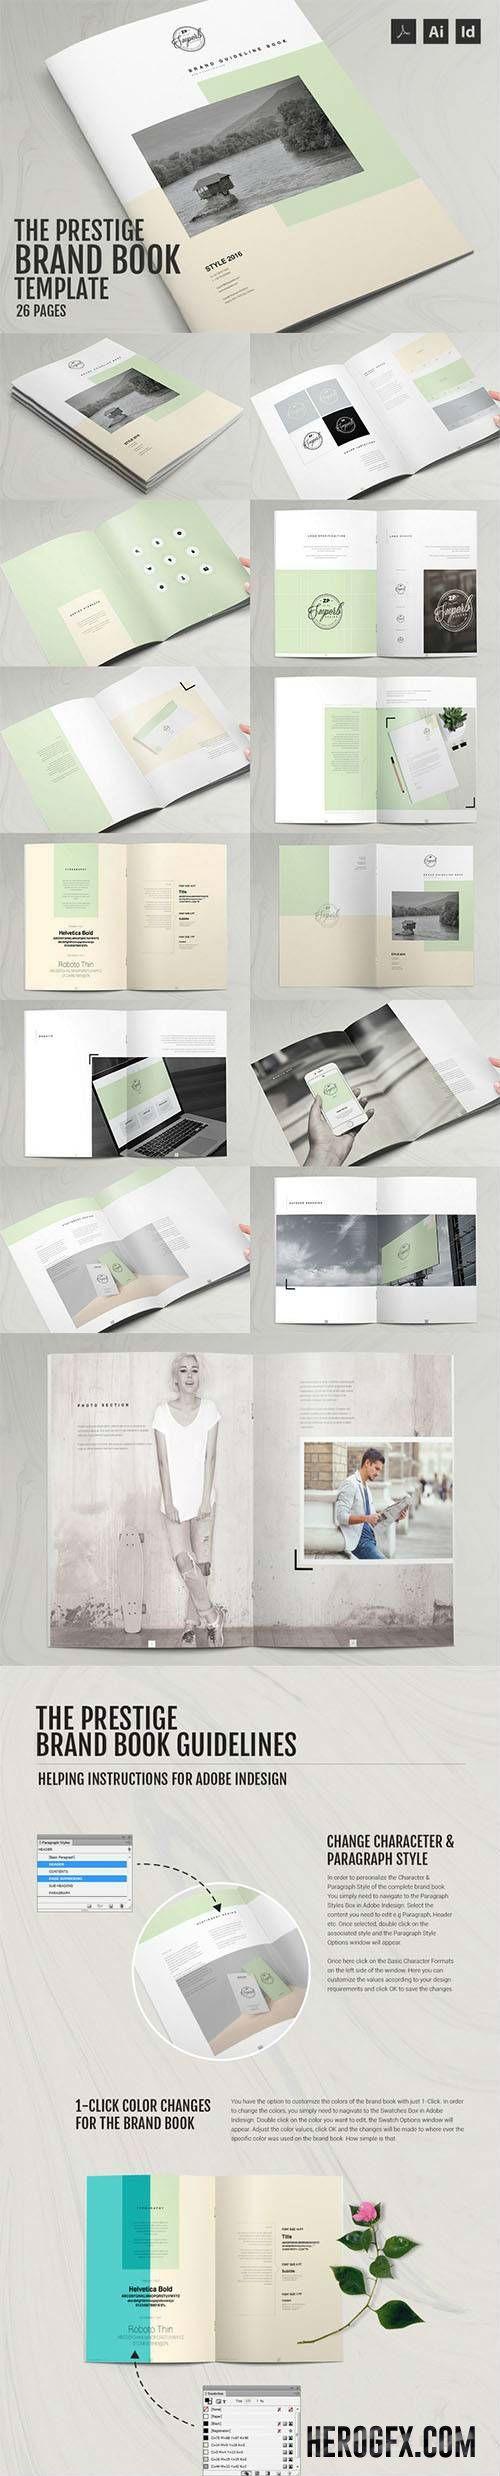 Indesign The Prestige - Brand Manual Template 530845